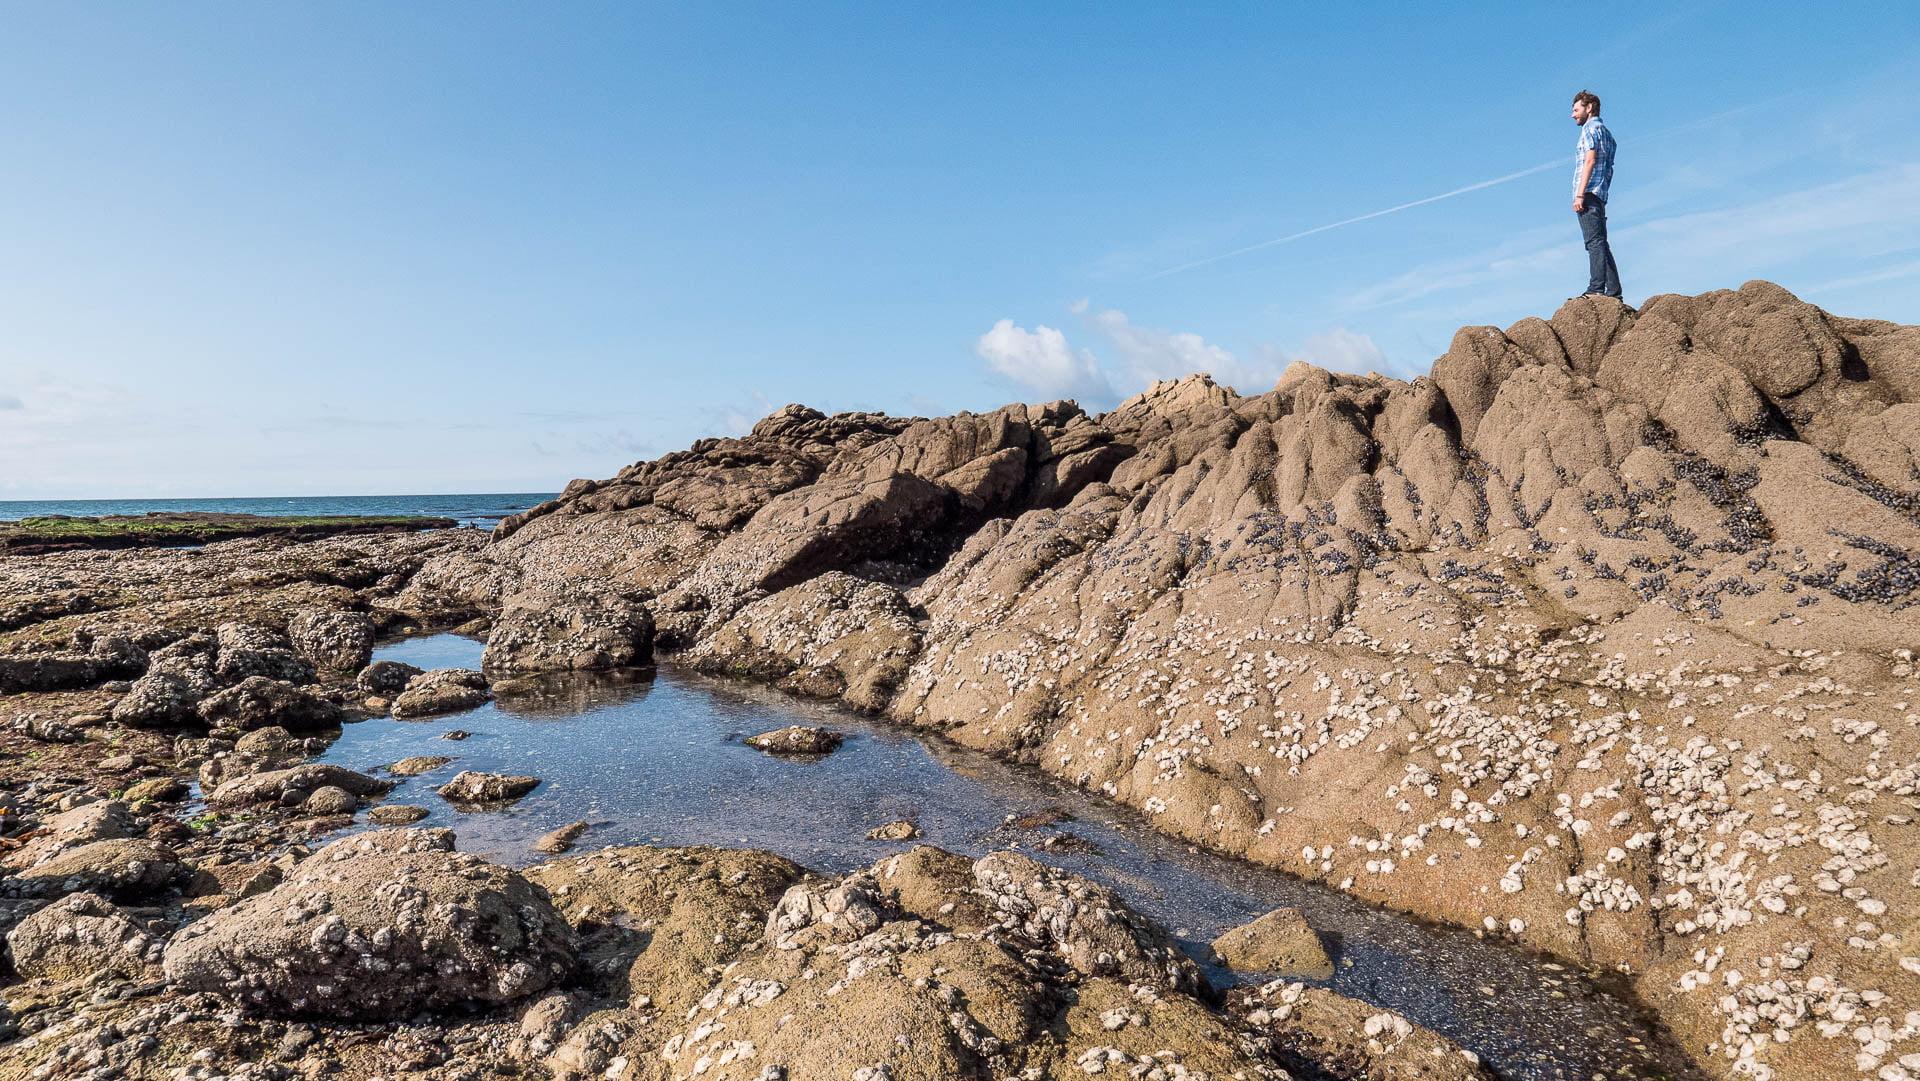 Piriac castelli roche paysage seb - Les globe blogueurs - blog voyage nature